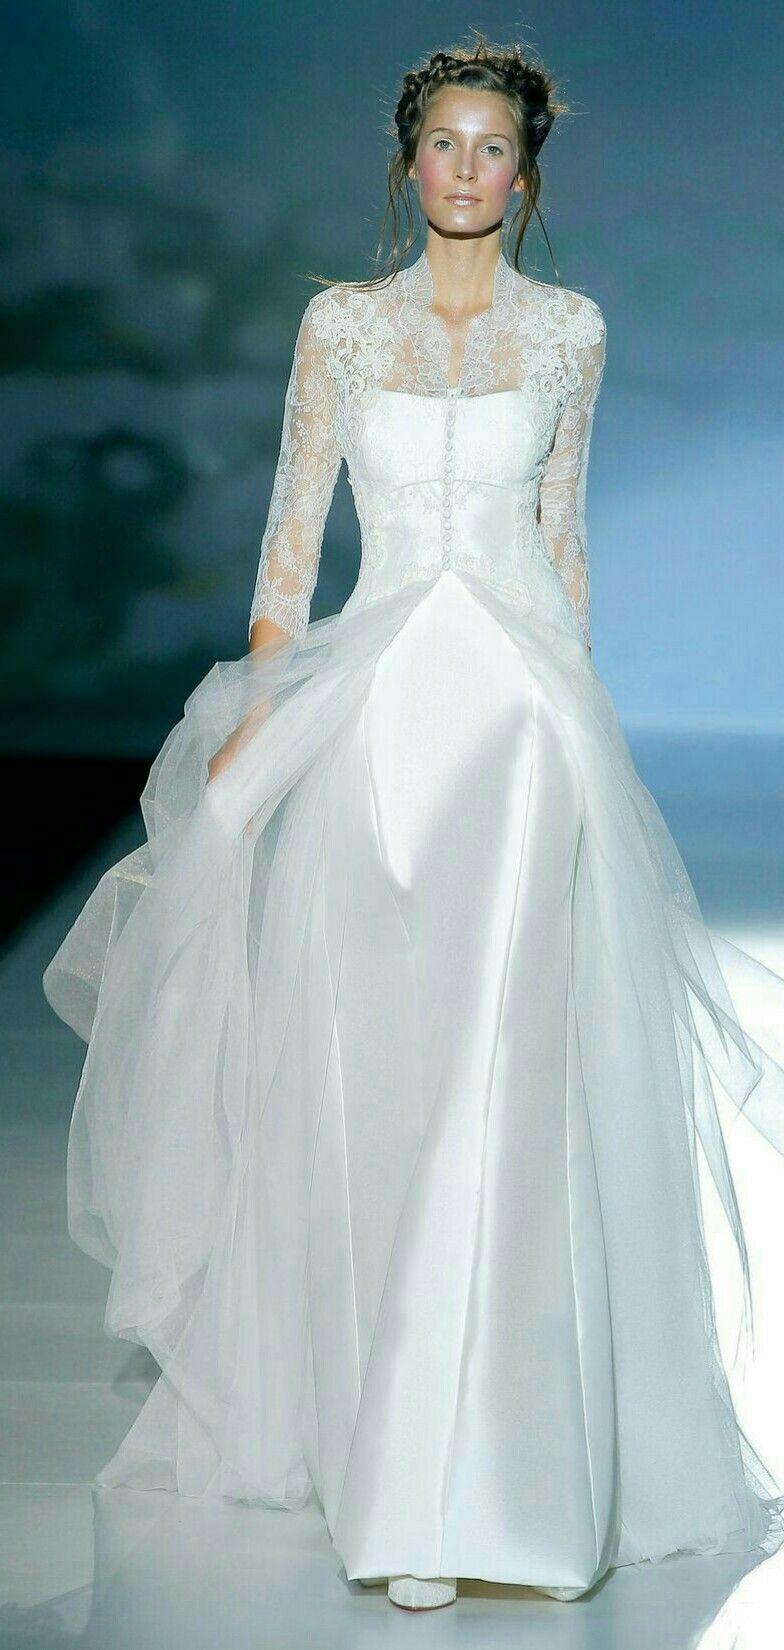 Pin by nina du preez on boleros and shoulders pinterest wedding